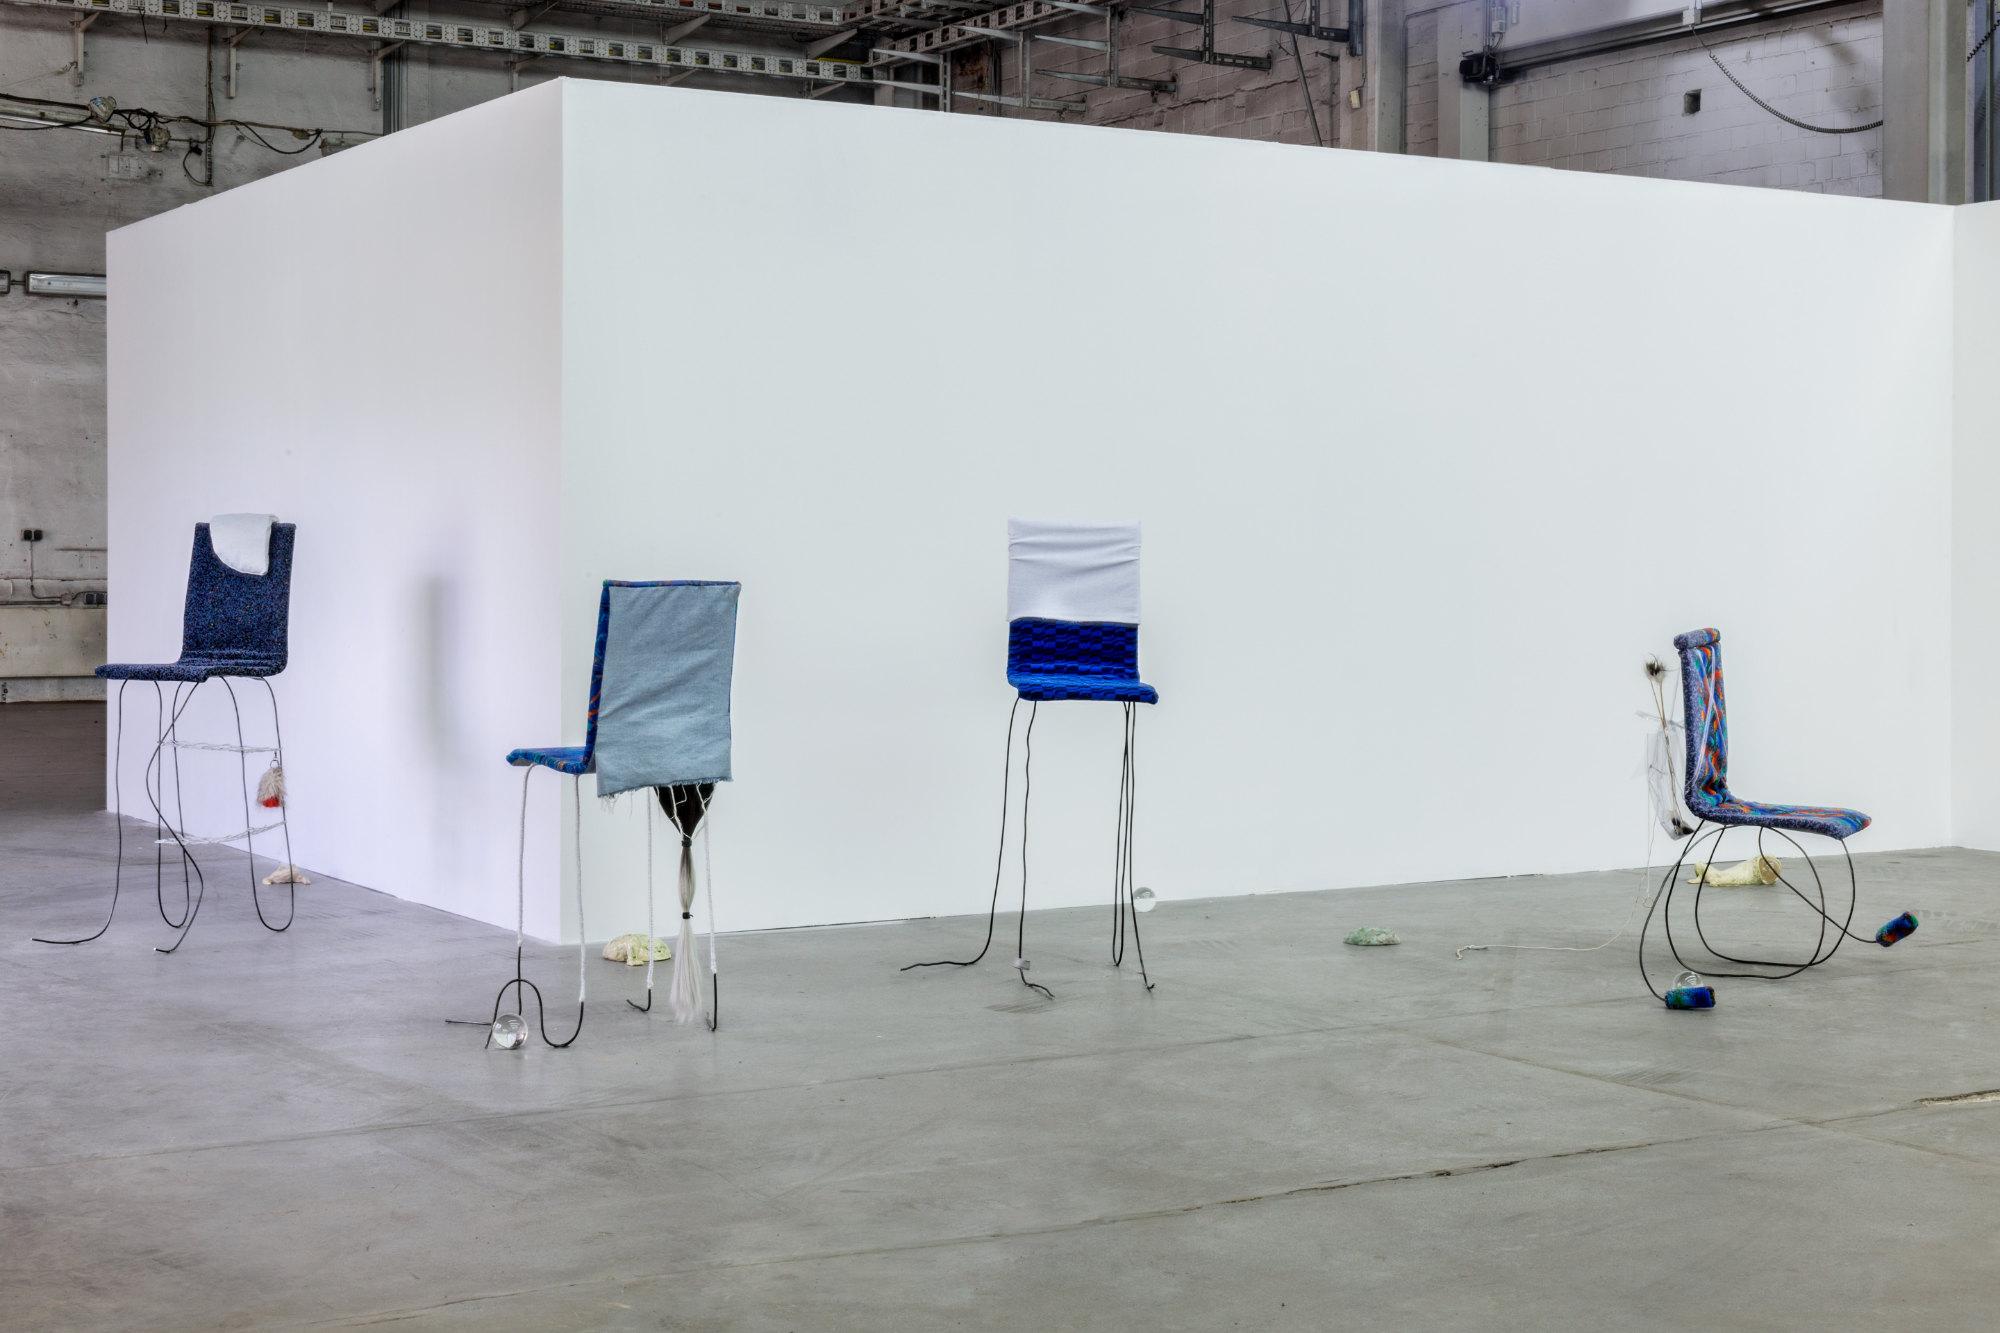 <p>Installationsansicht Nina Wiesnagrotzki, Foto: Anastasia Muna</p>